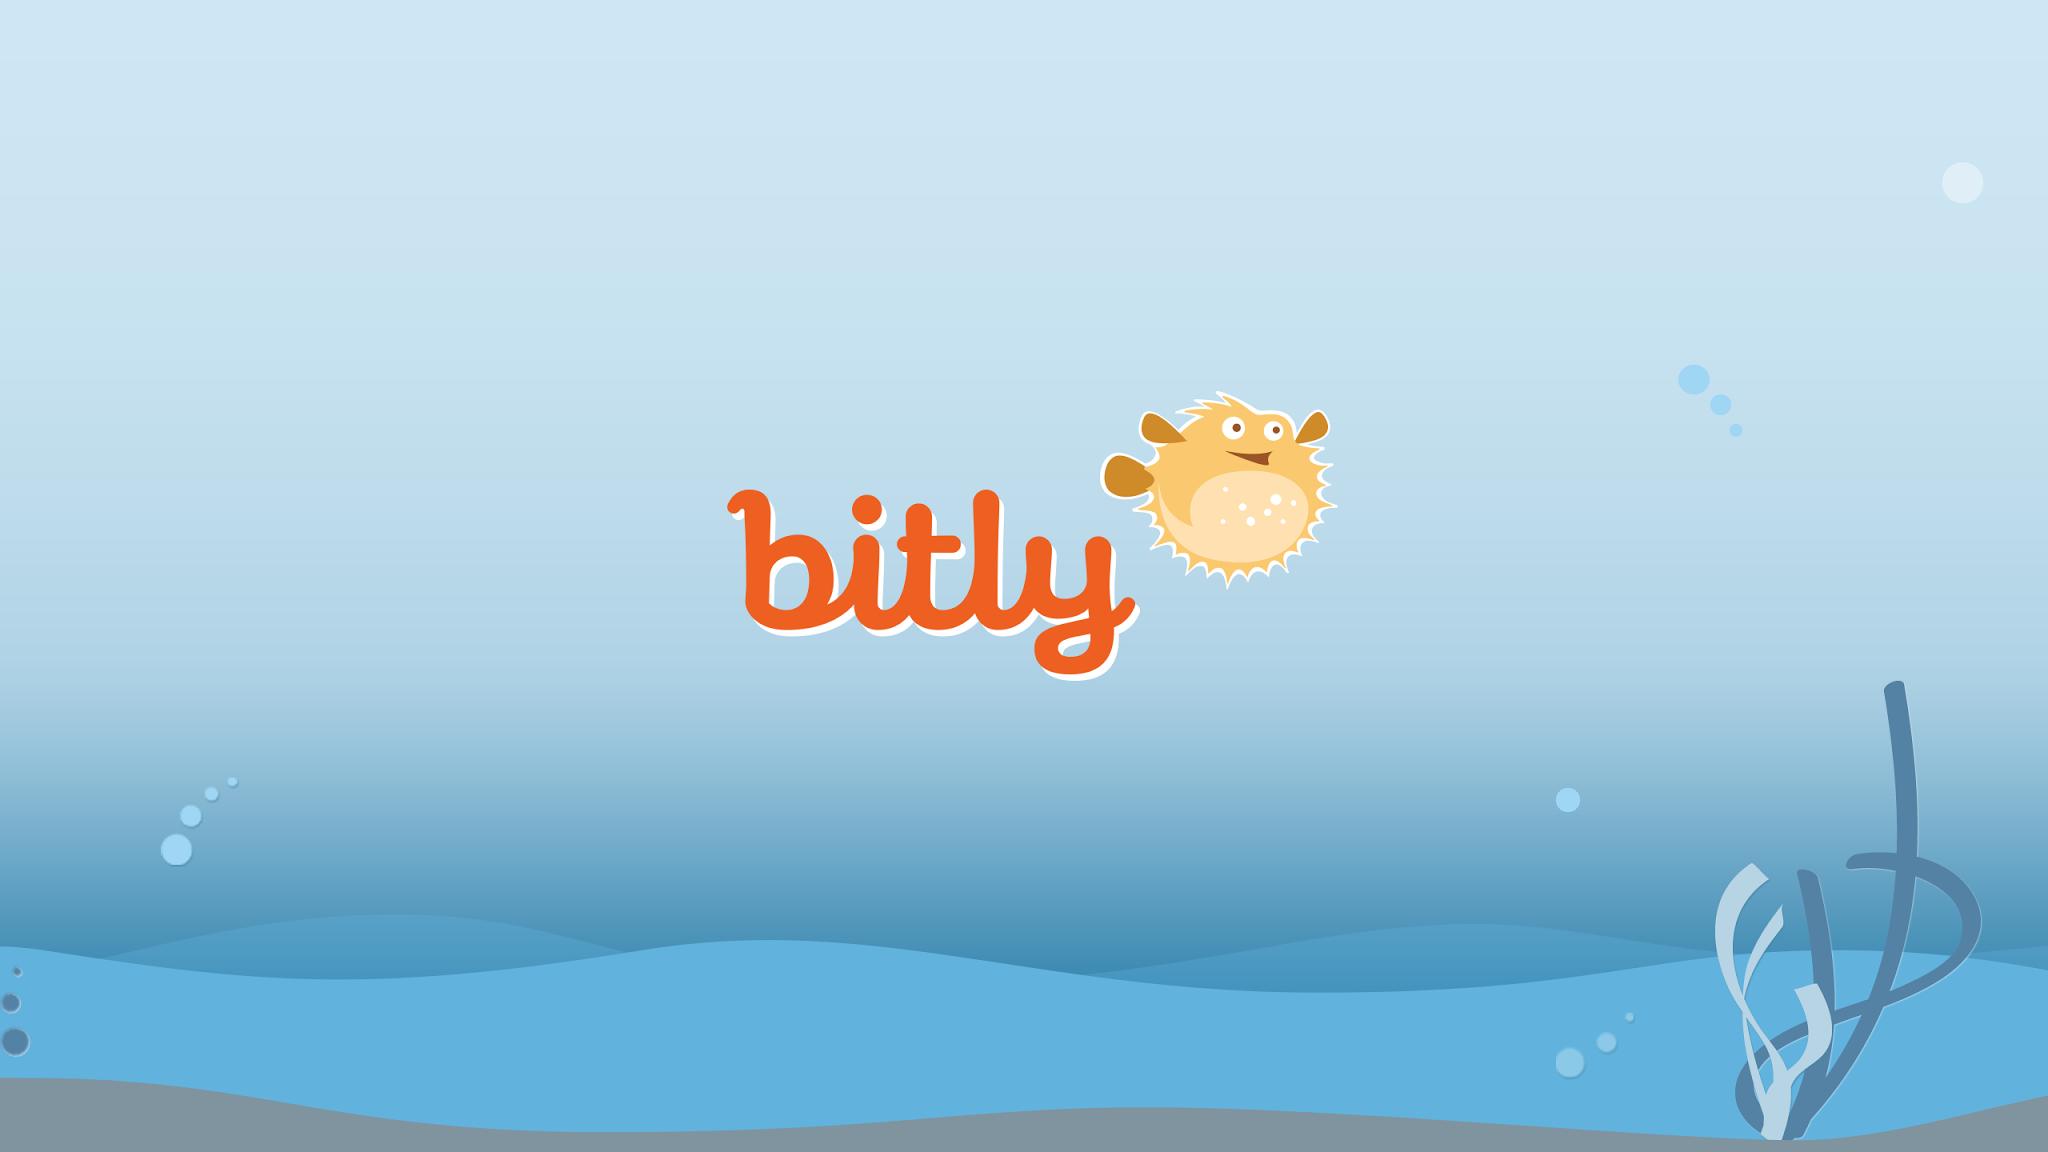 bit.ly